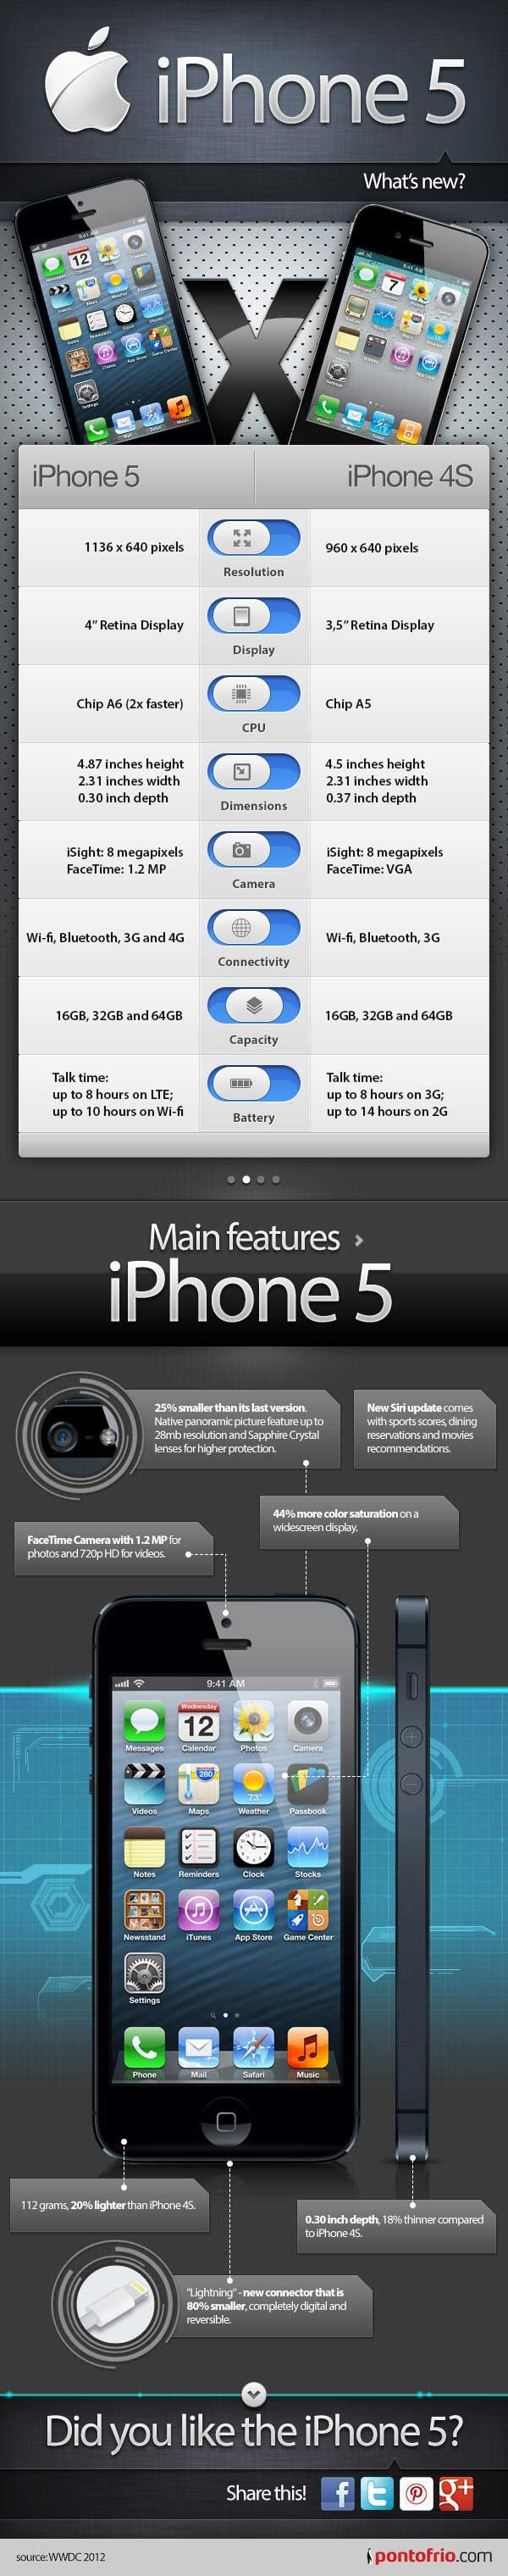 iPhone 5 vs iPhone 4S l #WhatsNew